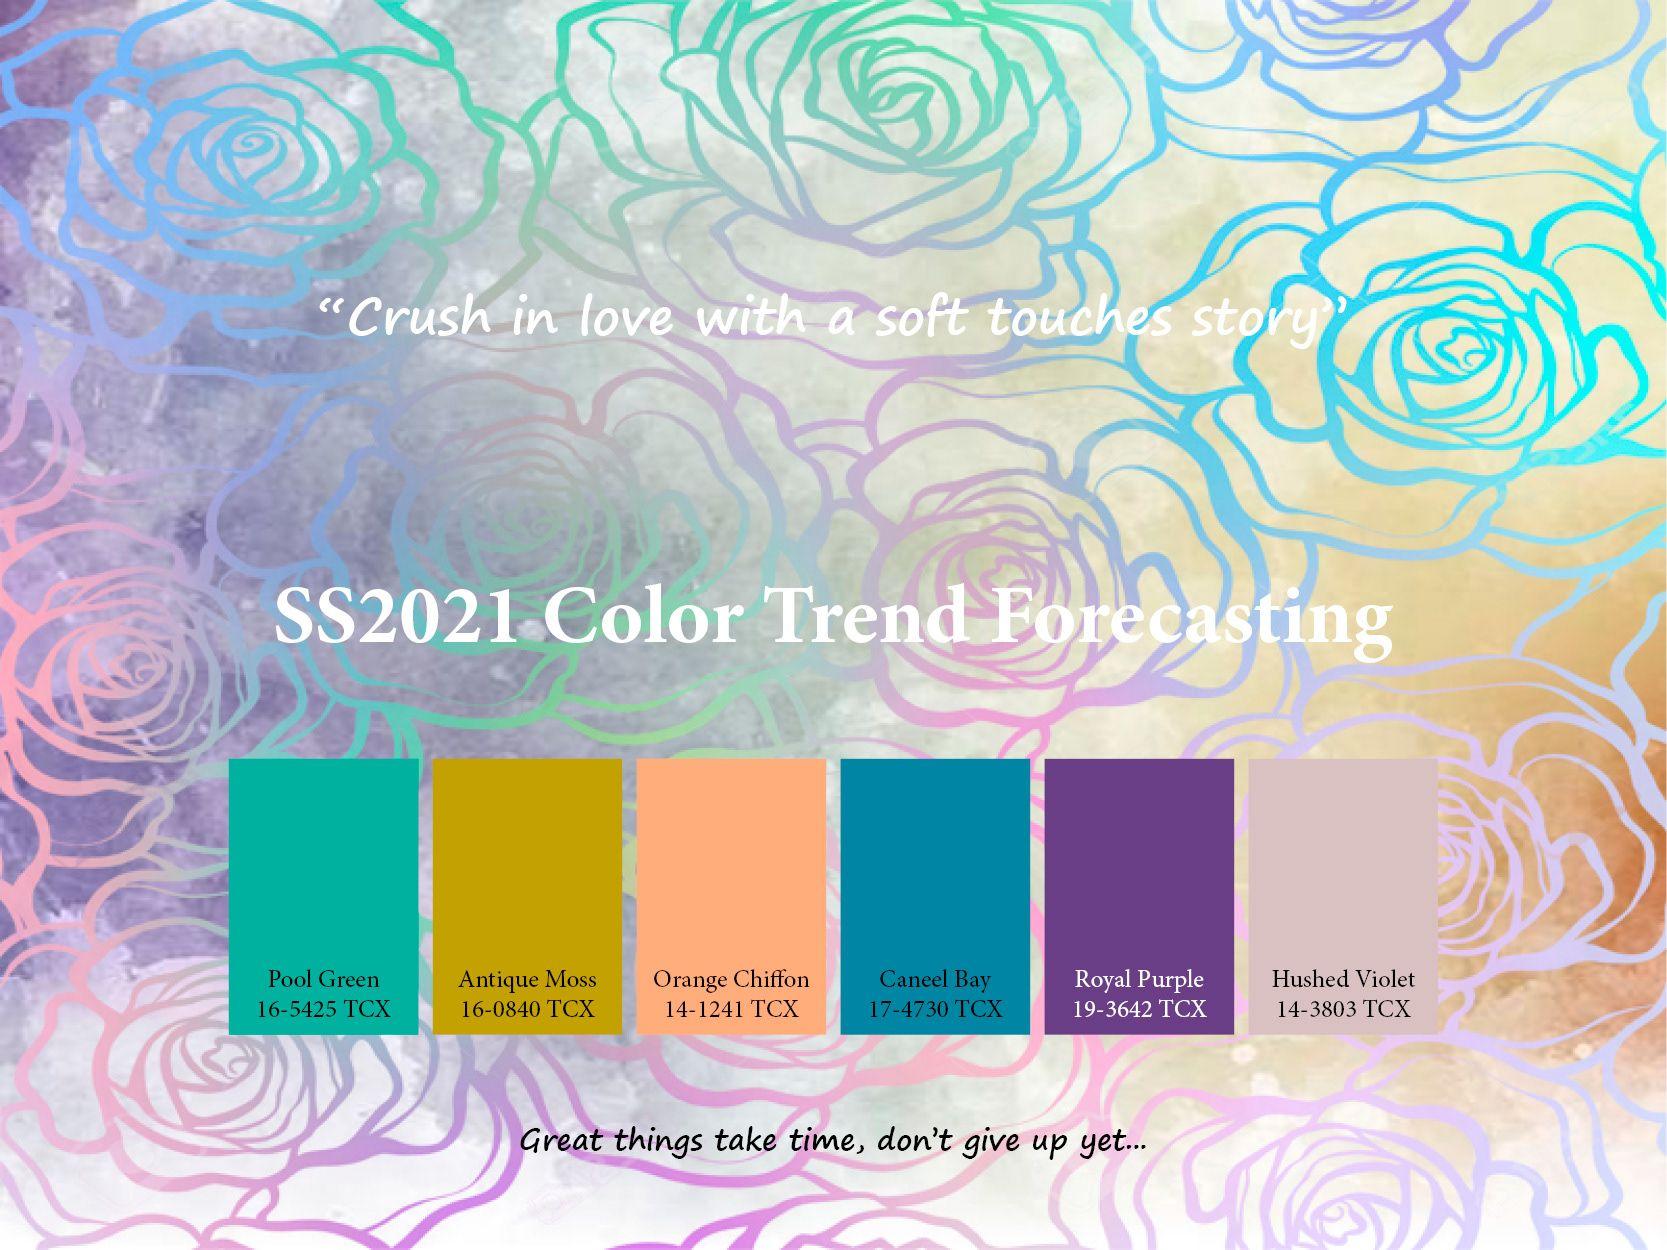 Fashion Web Graphic design and development. FashionWebGraphic@gmail.com 647 996 7071 - SS2021 Trend forecasting